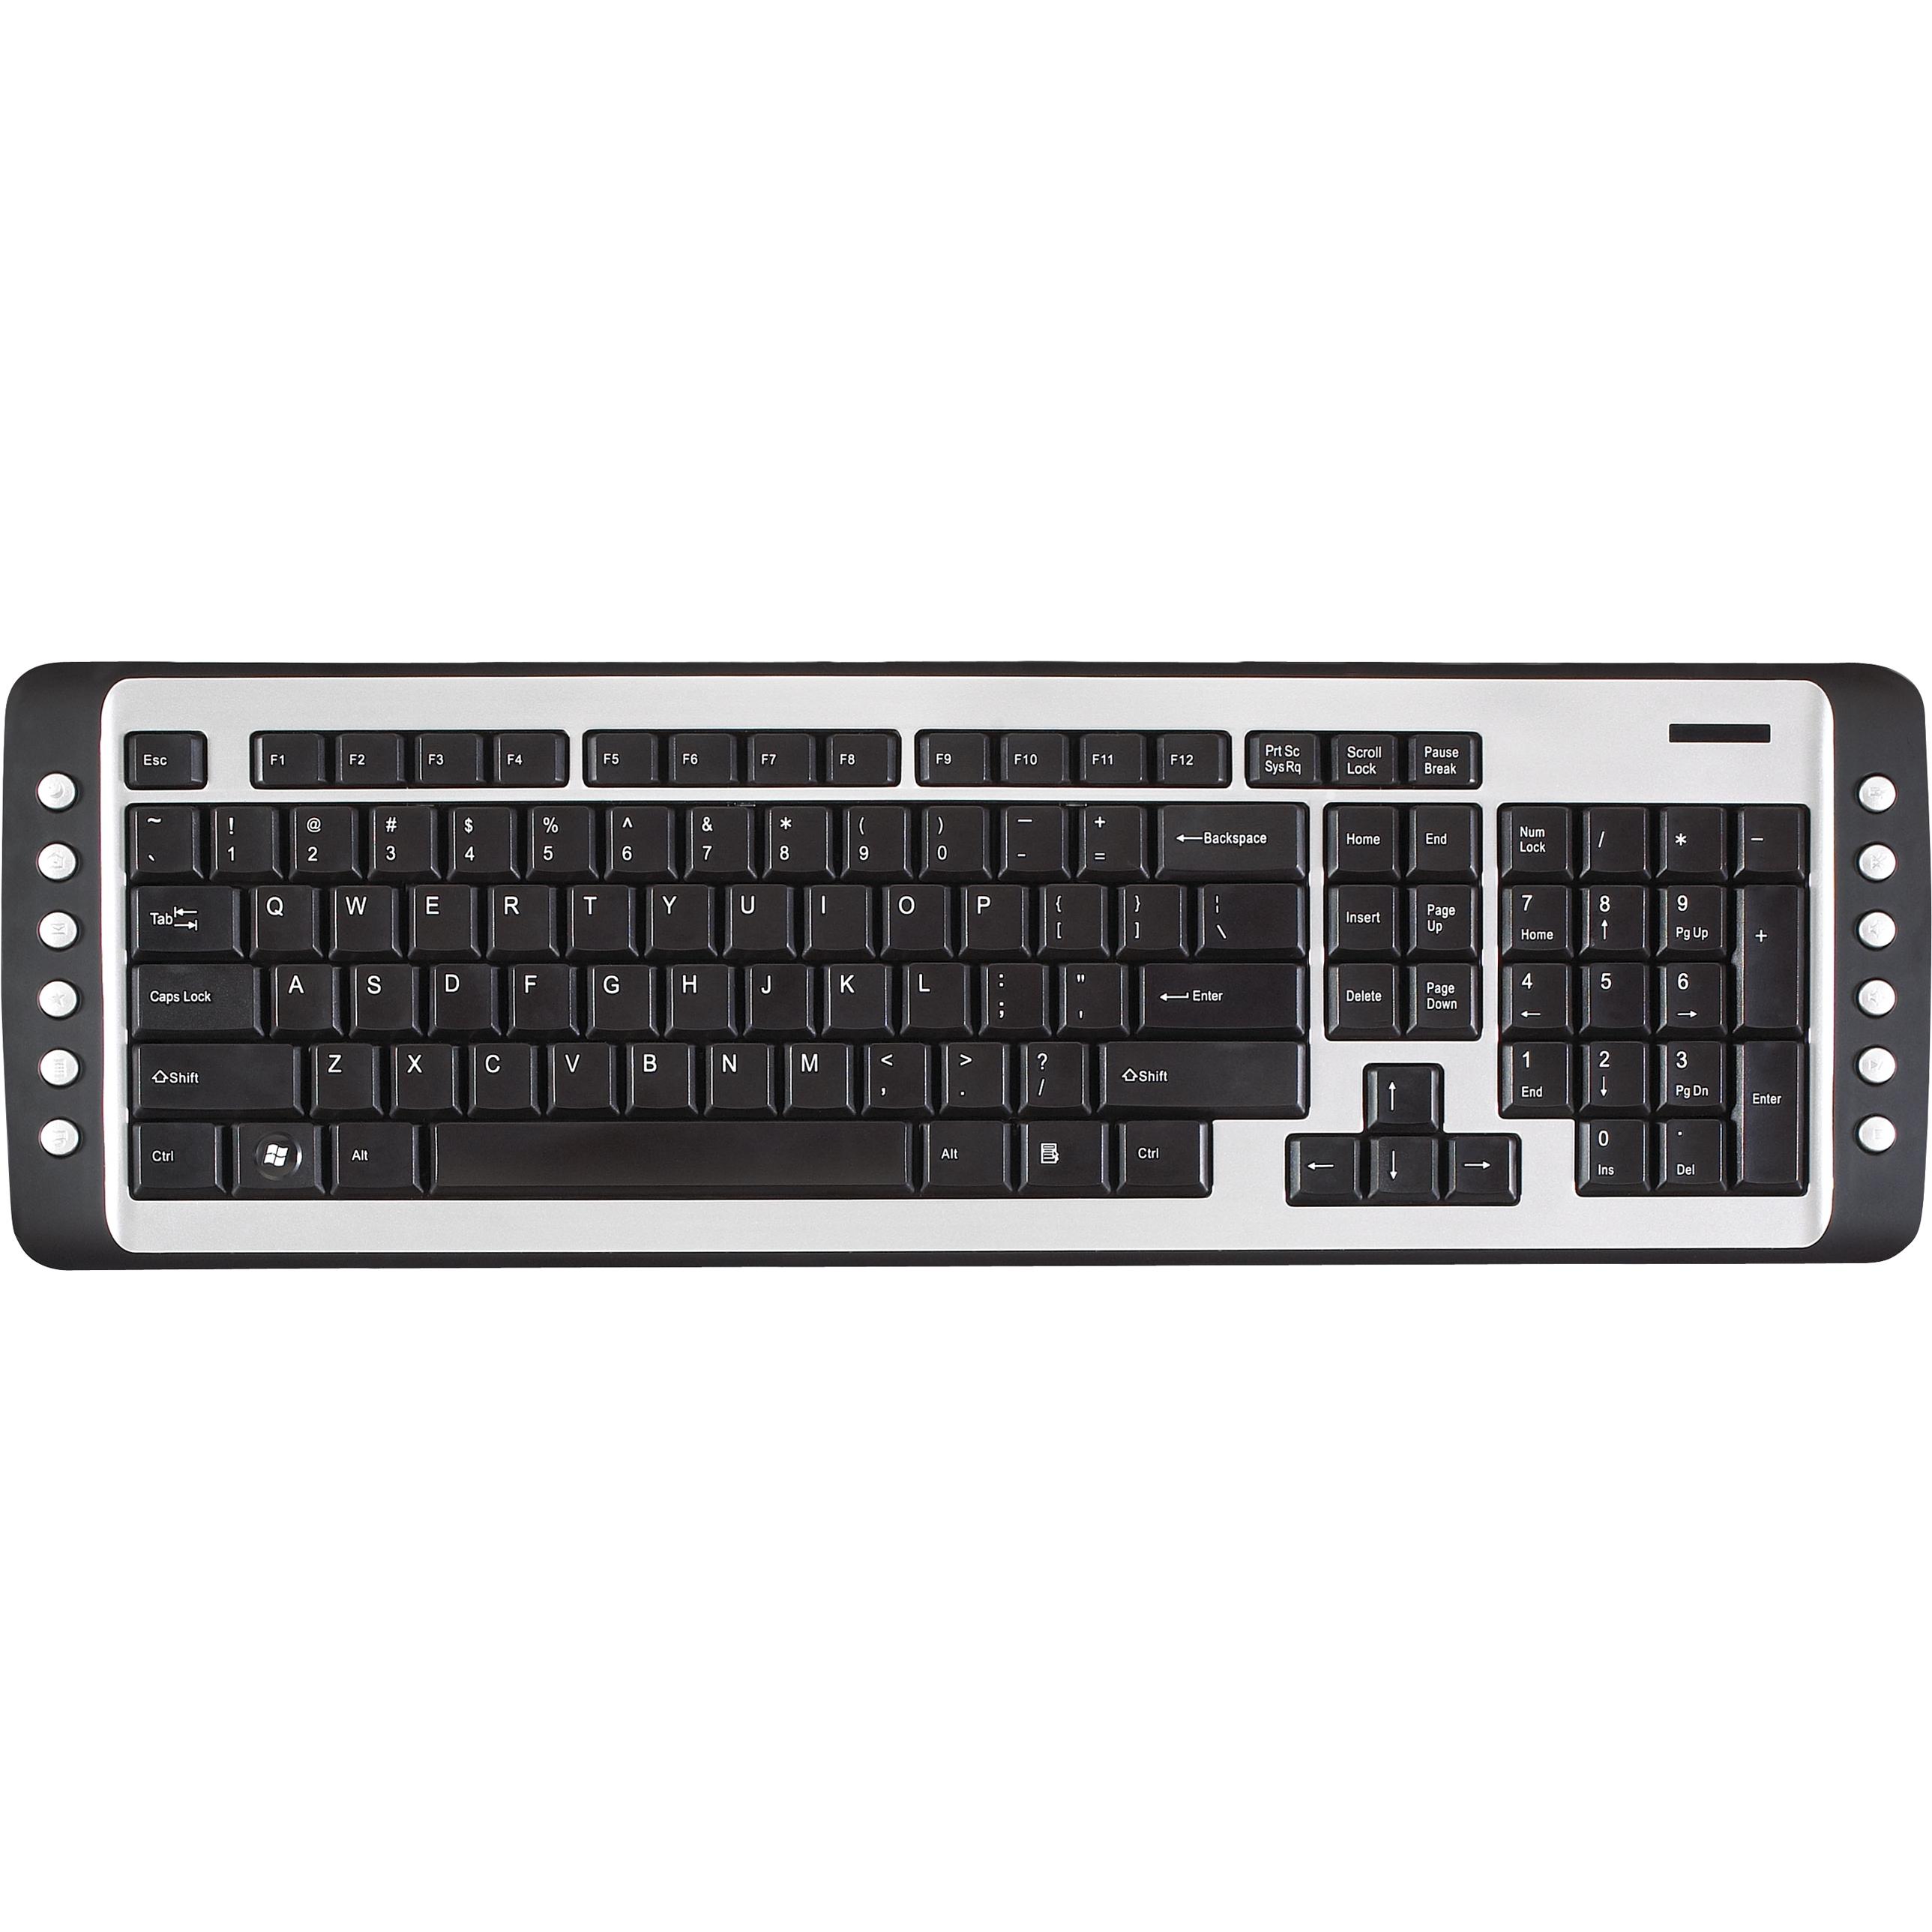 2 4 ghz wireless multimedia keyboard black silver akb24us keyboards targus. Black Bedroom Furniture Sets. Home Design Ideas